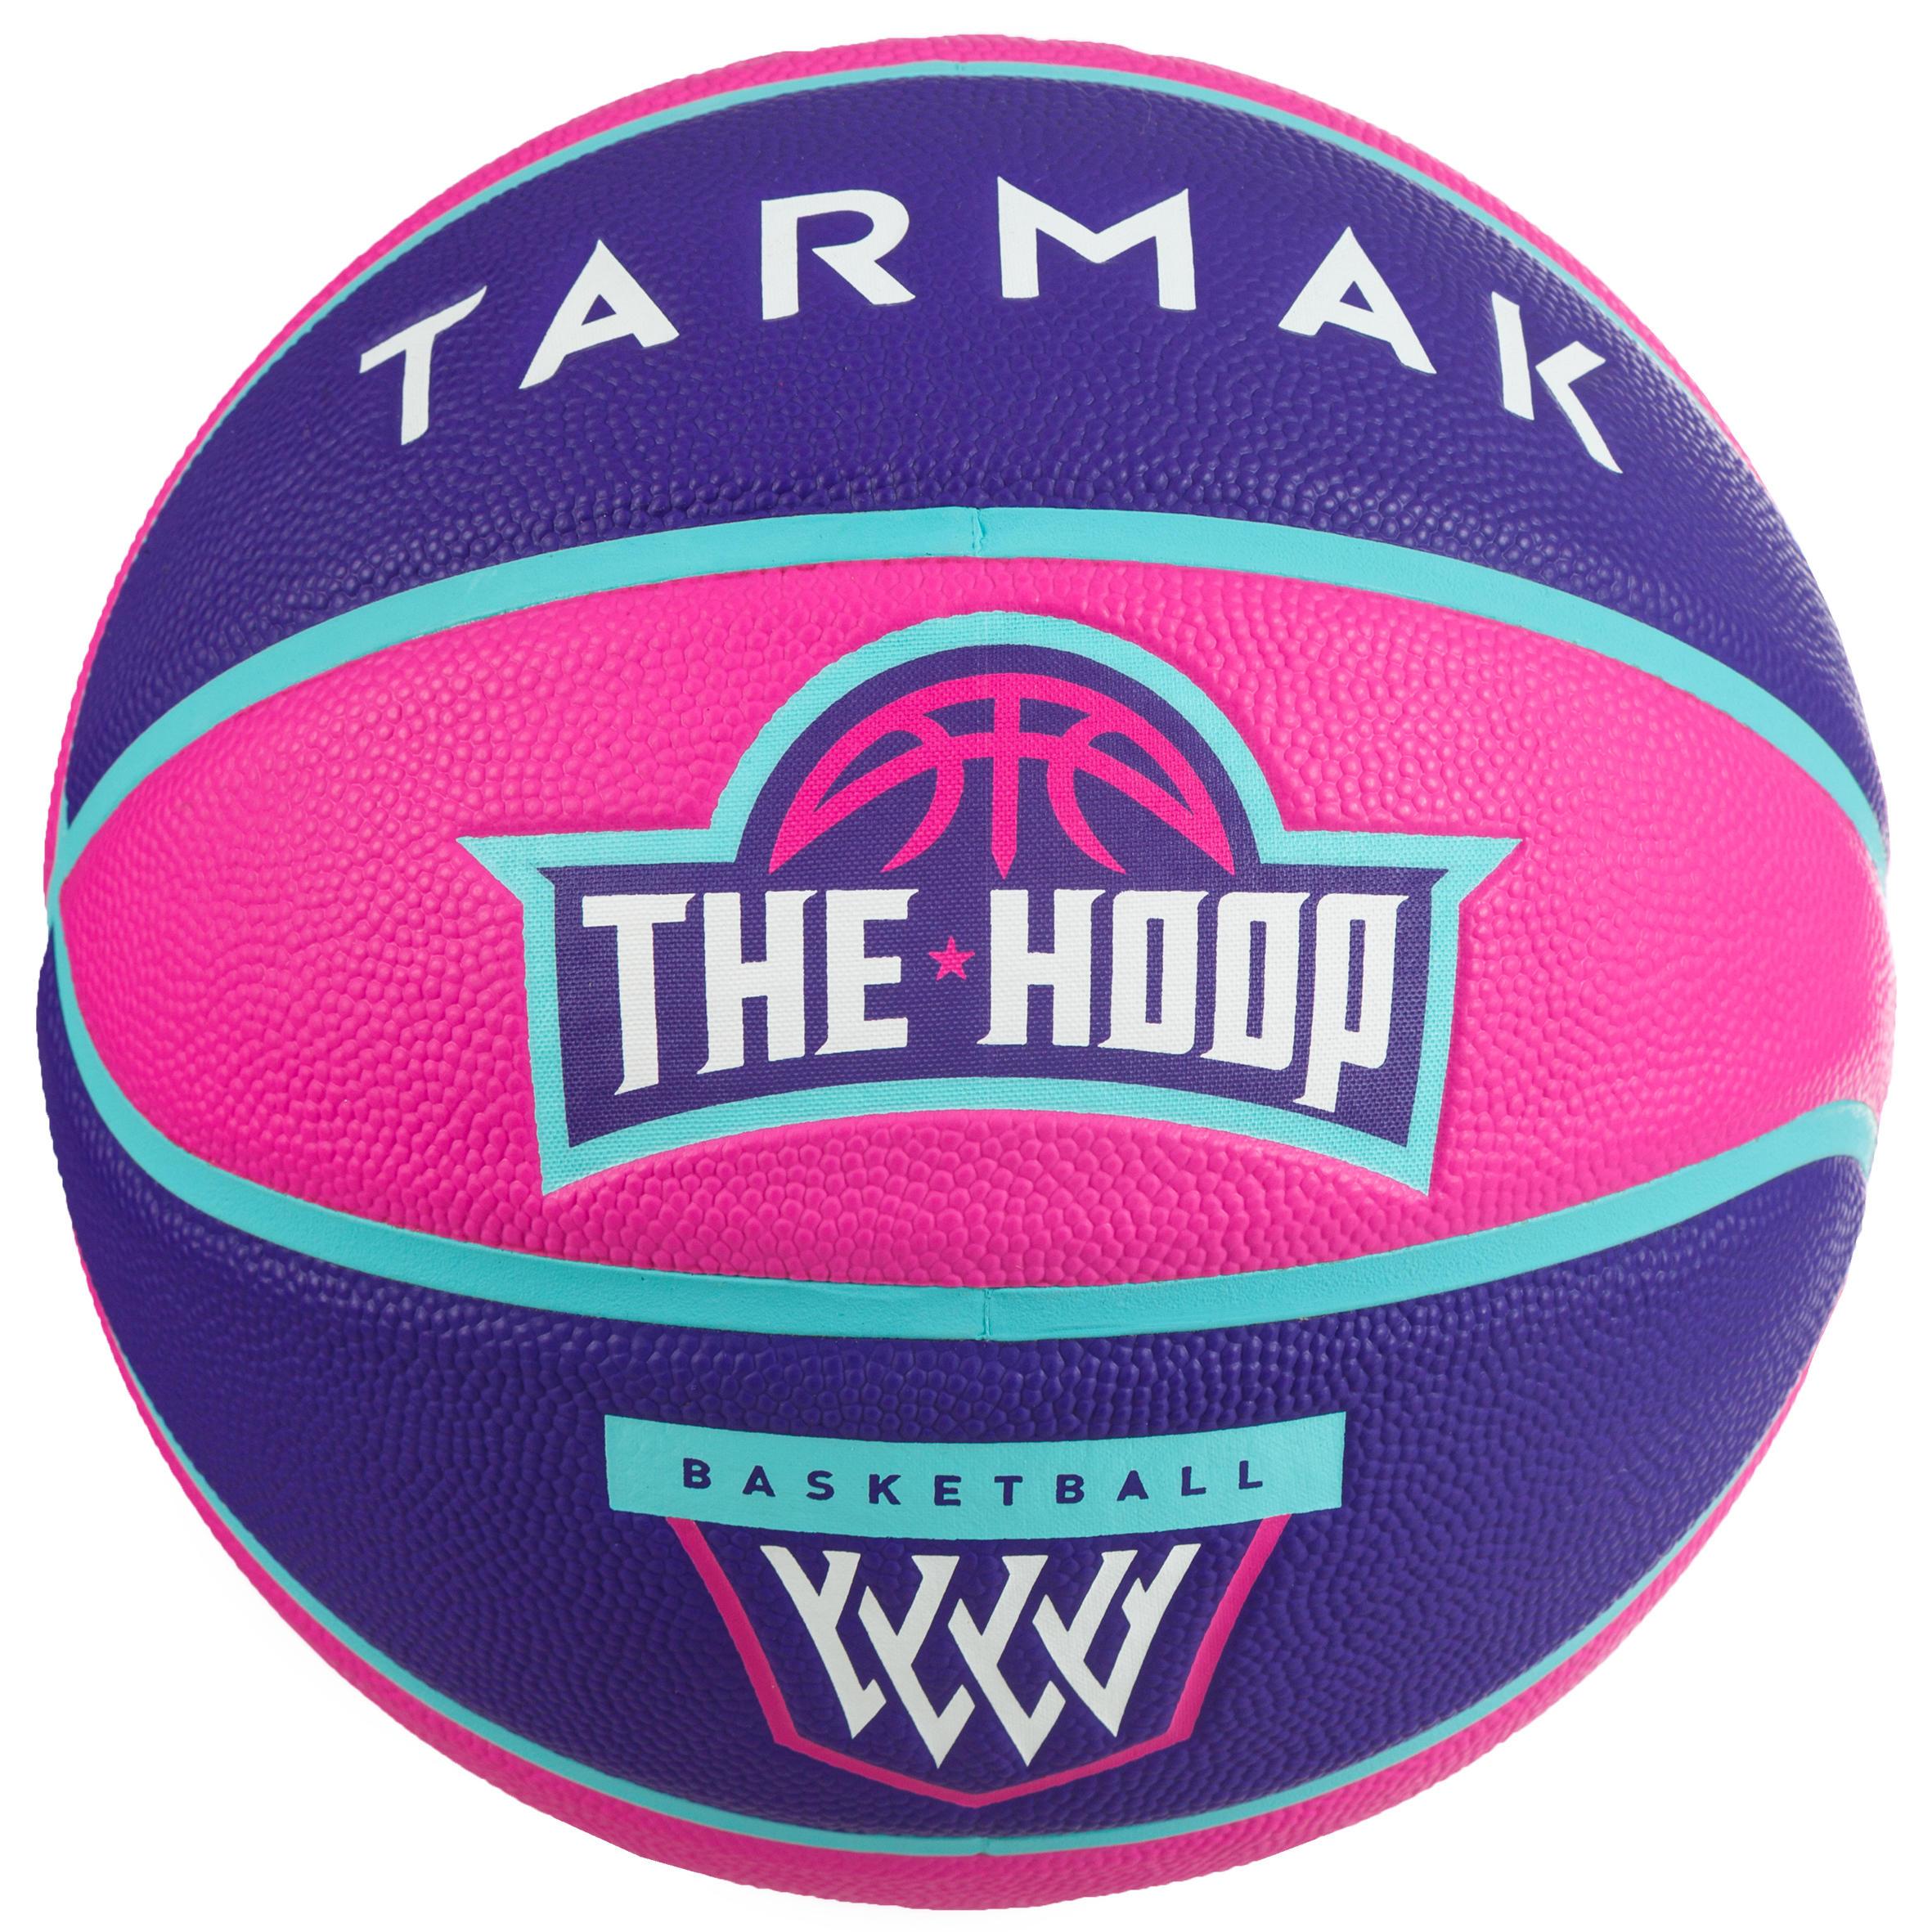 Basketball Wizzy Größe 5 Kinder rosa/violett